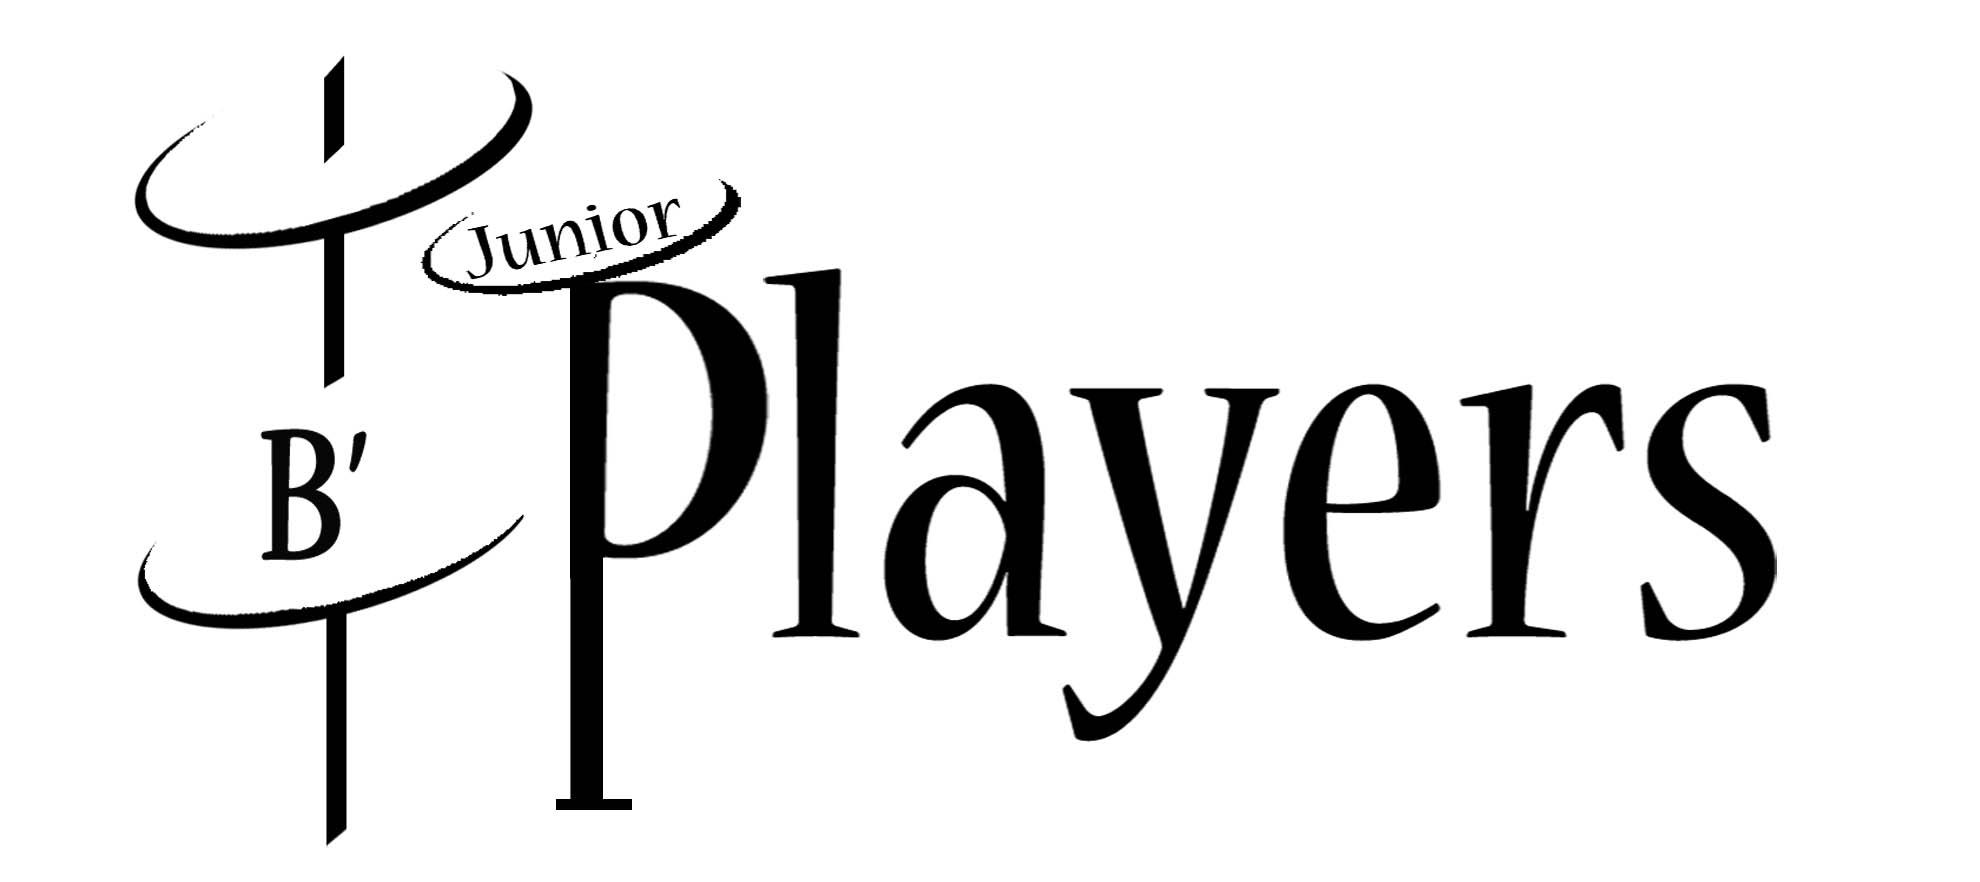 TBT Junior Players